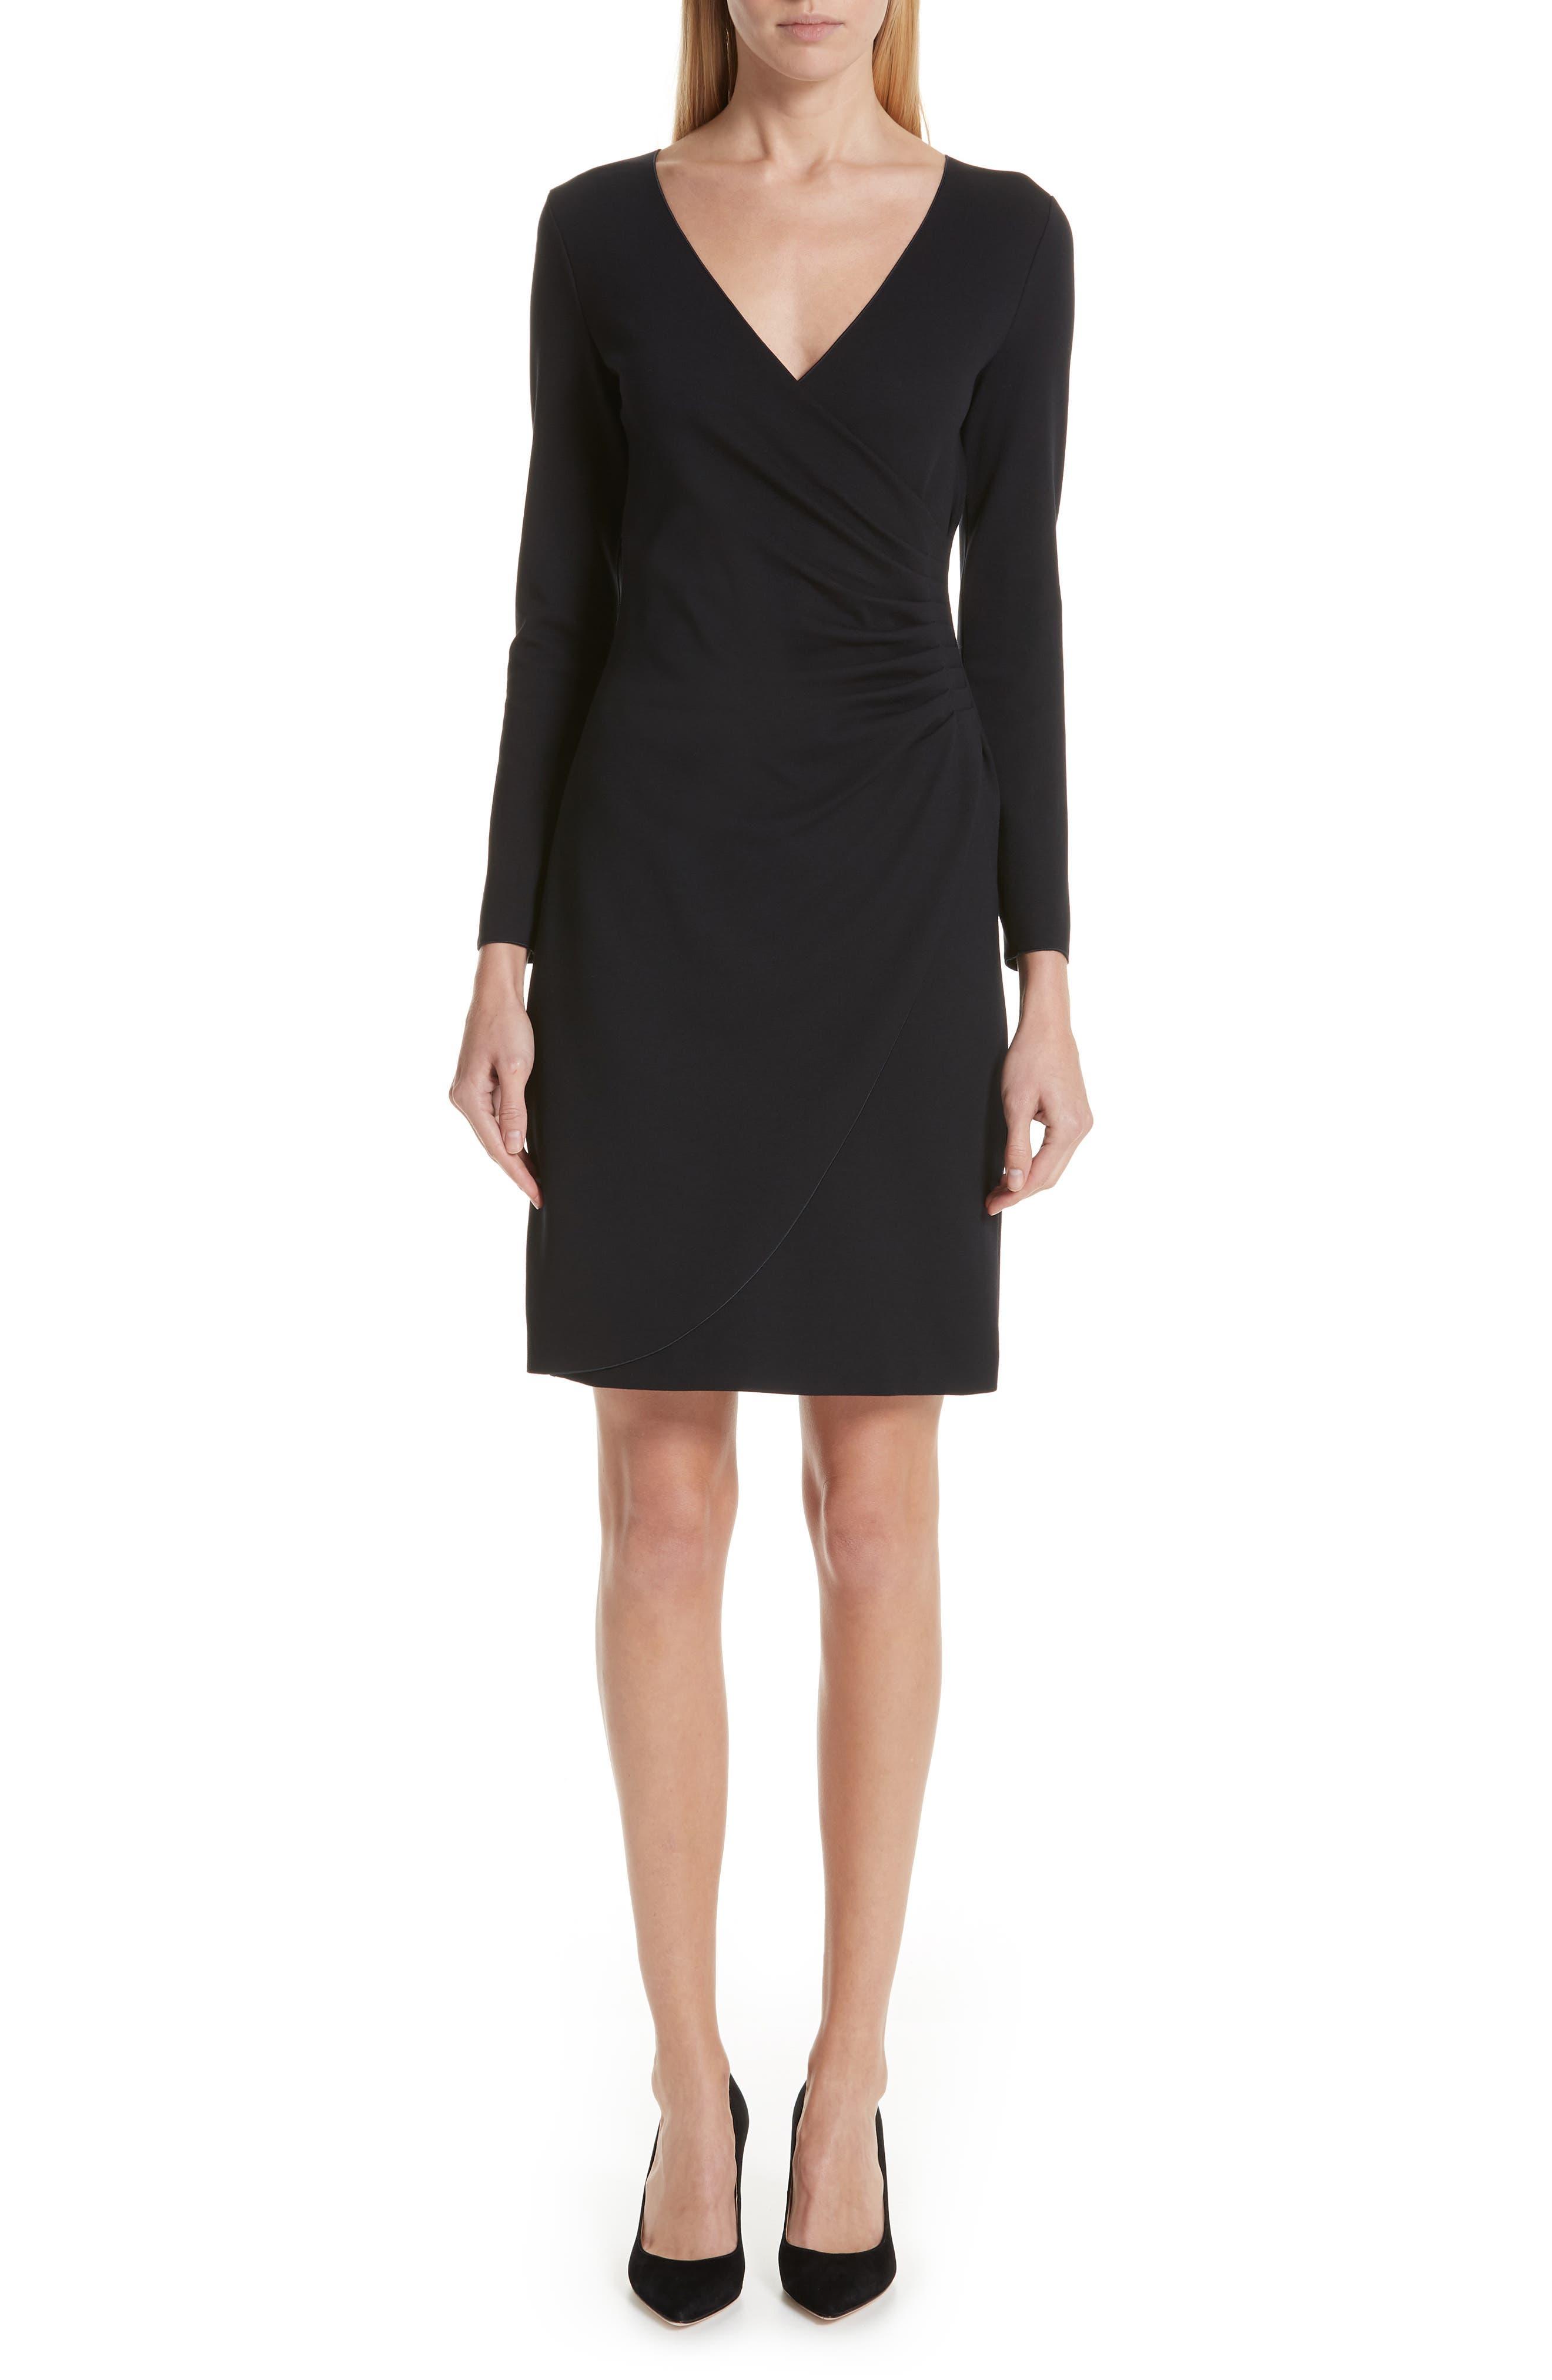 Punto Milano Faux Wrap Dress in Black from ARMANI.COM